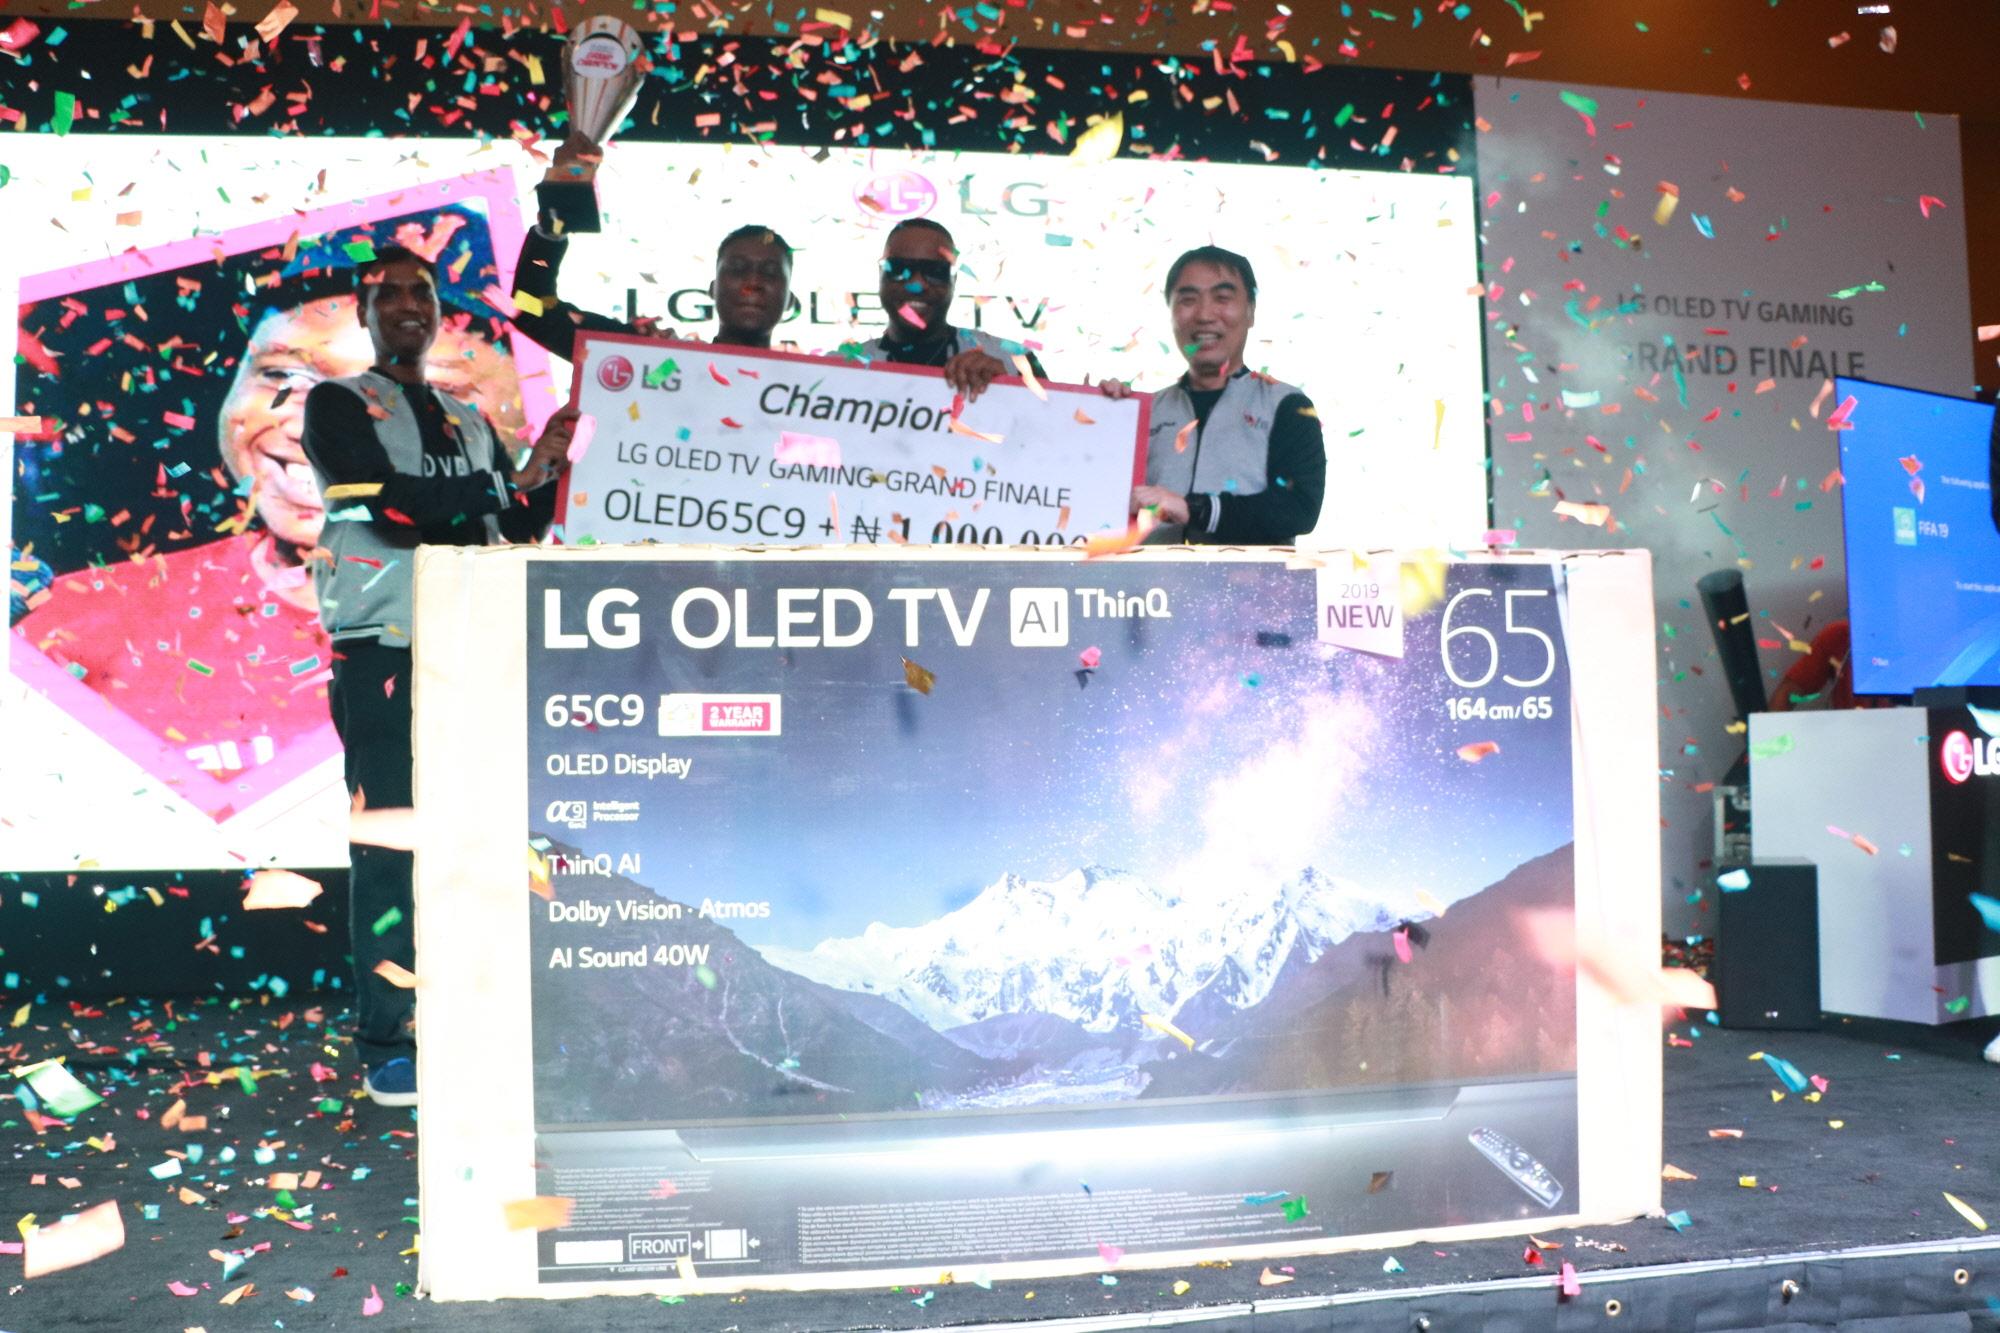 LG전자가 지난 주말 나이지리아 라고스 지역에서 LG 올레드 TV 게이밍 챌린지를 열었다. 최종 우승자는 부상으로 LG 올레드 TV와 1백만 나이라(한화 330만 원 상당)를 받았다. 사진은 우승자가 무대에서 환호하는 모습.